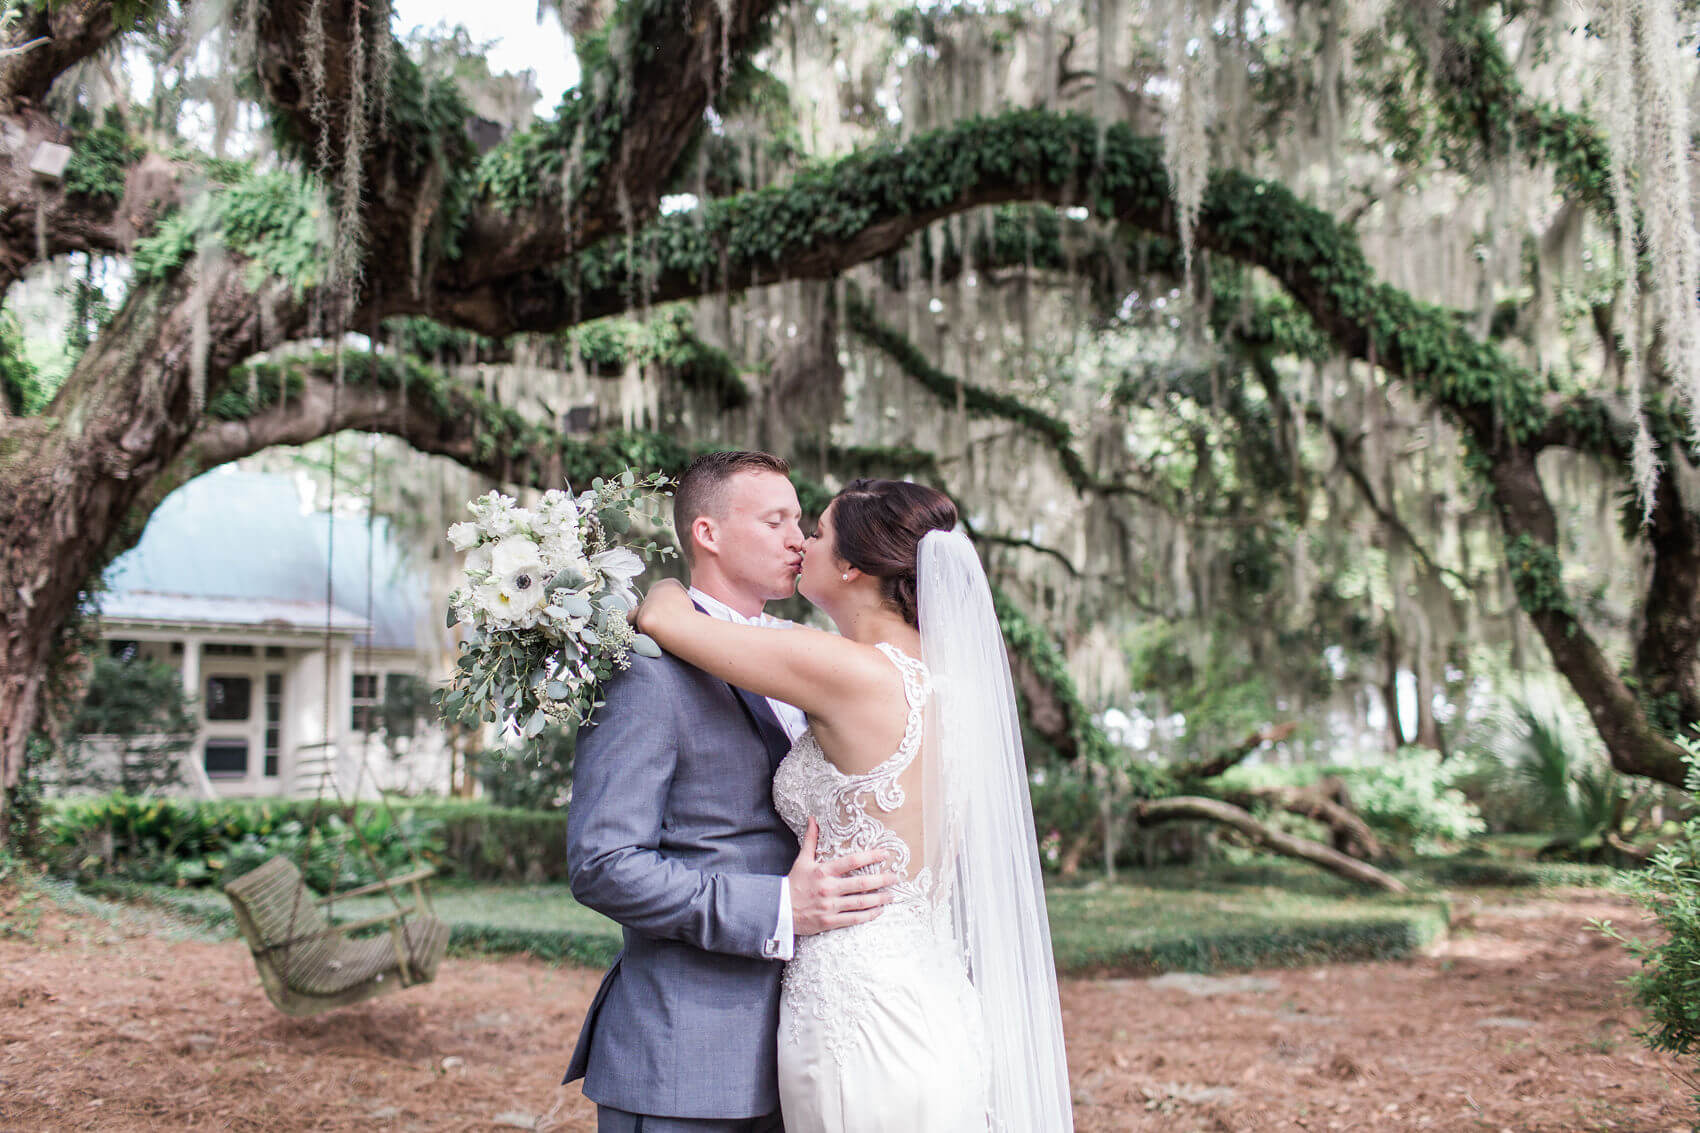 apt-b-photography-savannah-wedding-photographer-savannah-wedding-charleston-wedding-photographer-31.jpg